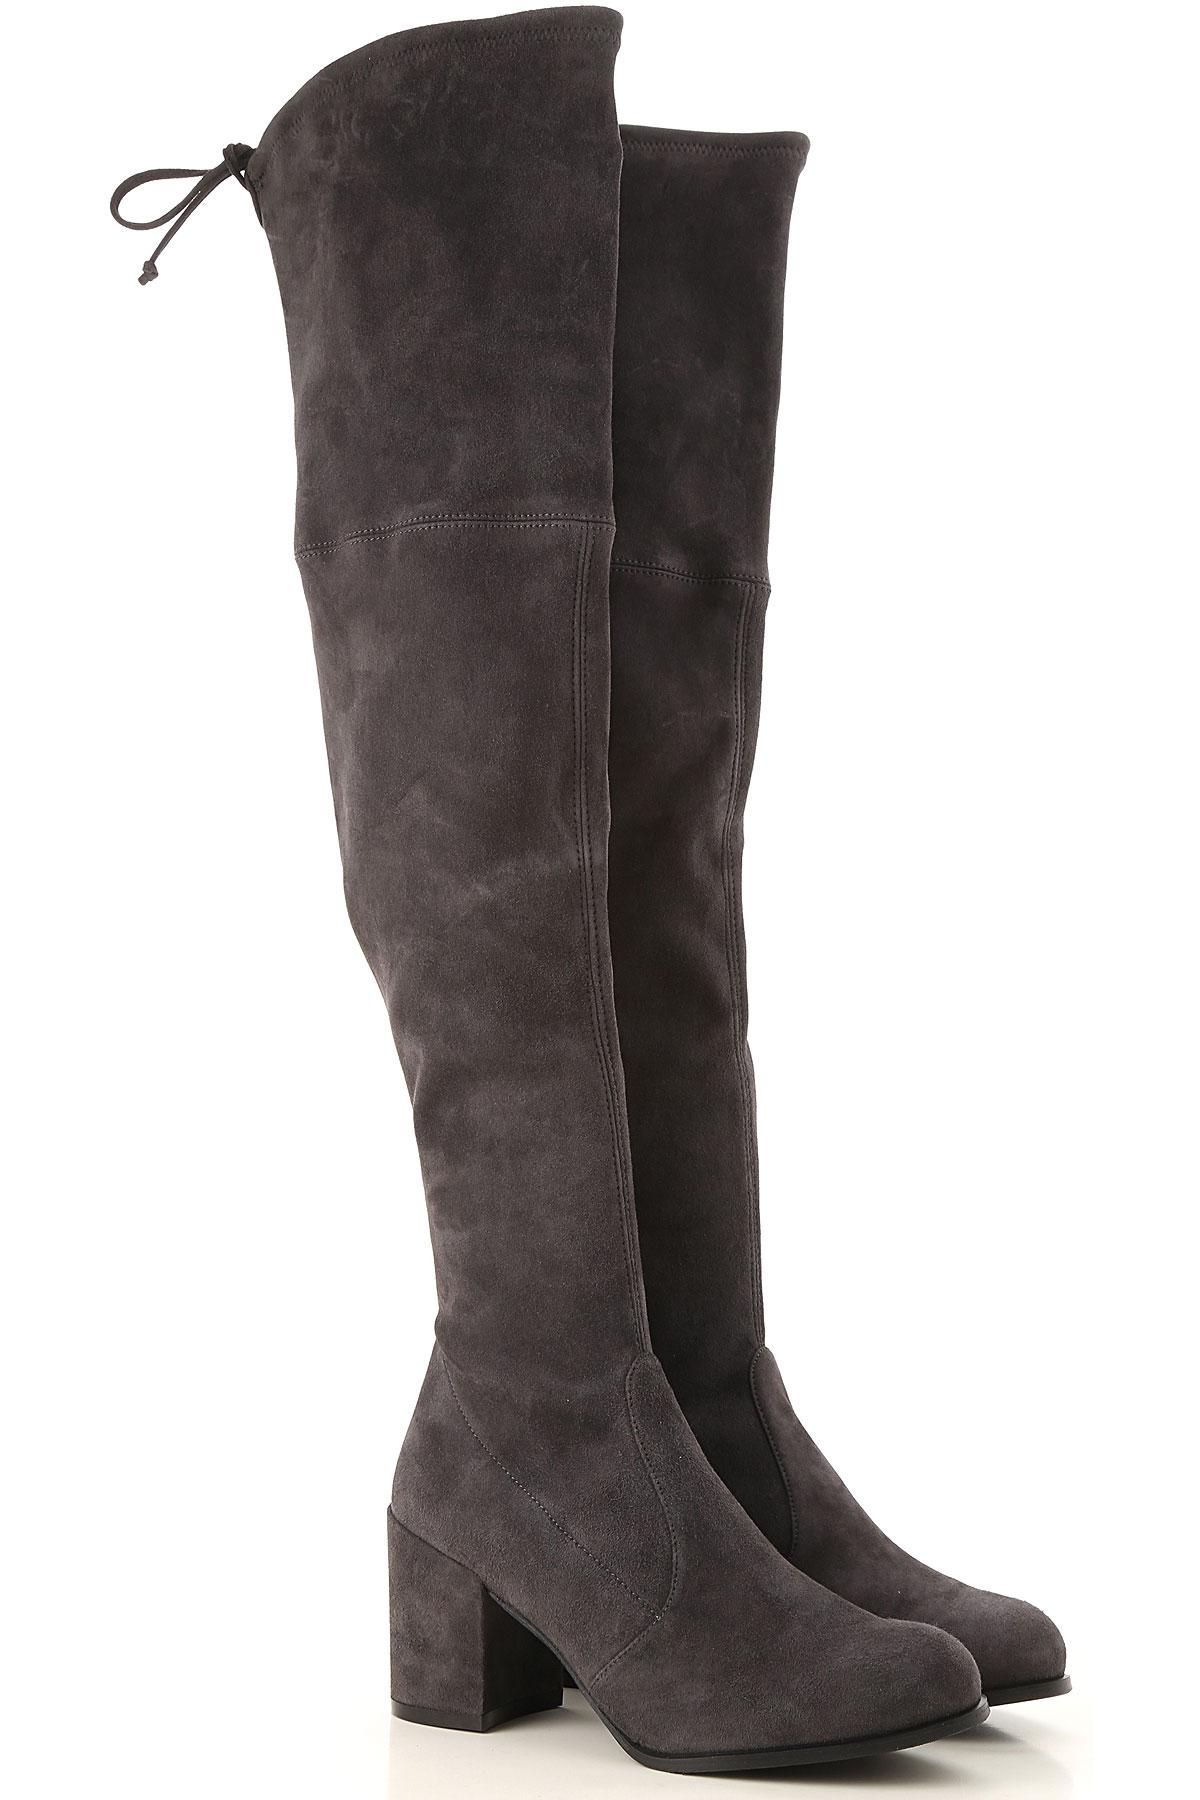 Stuart Weitzman Boots for Women, Booties On Sale, Asphalt Grey, suede, 2019, US 6.5 (EU 37) US 7.5 (EU 38) US 8.5 (EU 39)